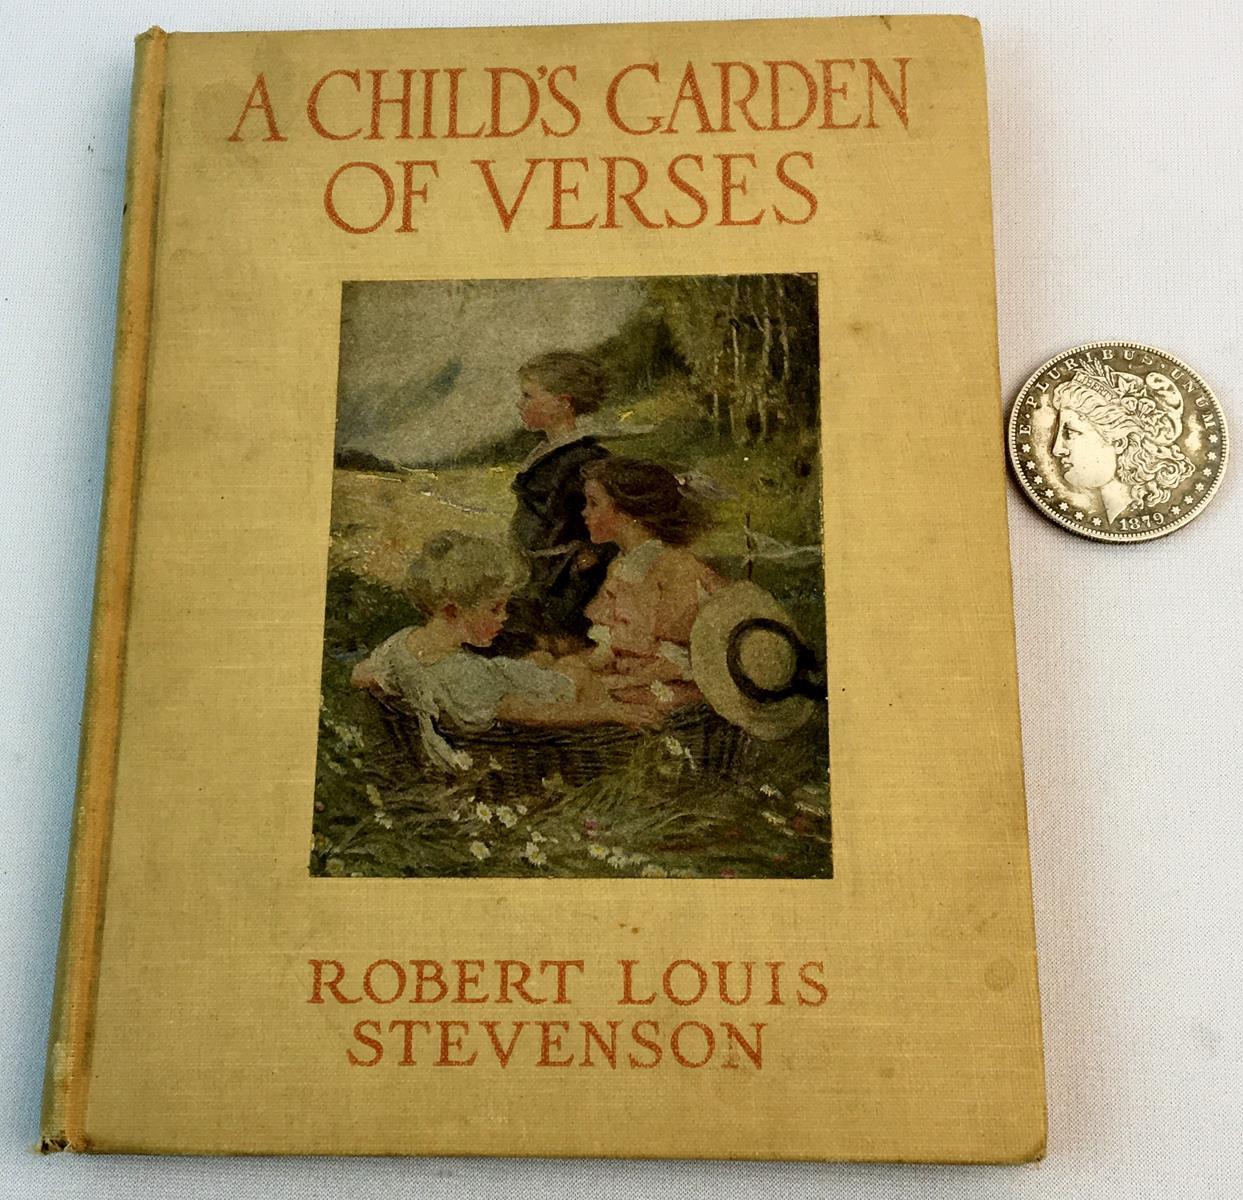 1916 A Child's Garden of Verses by Robert Louis Stevenson ILLUSTRATED